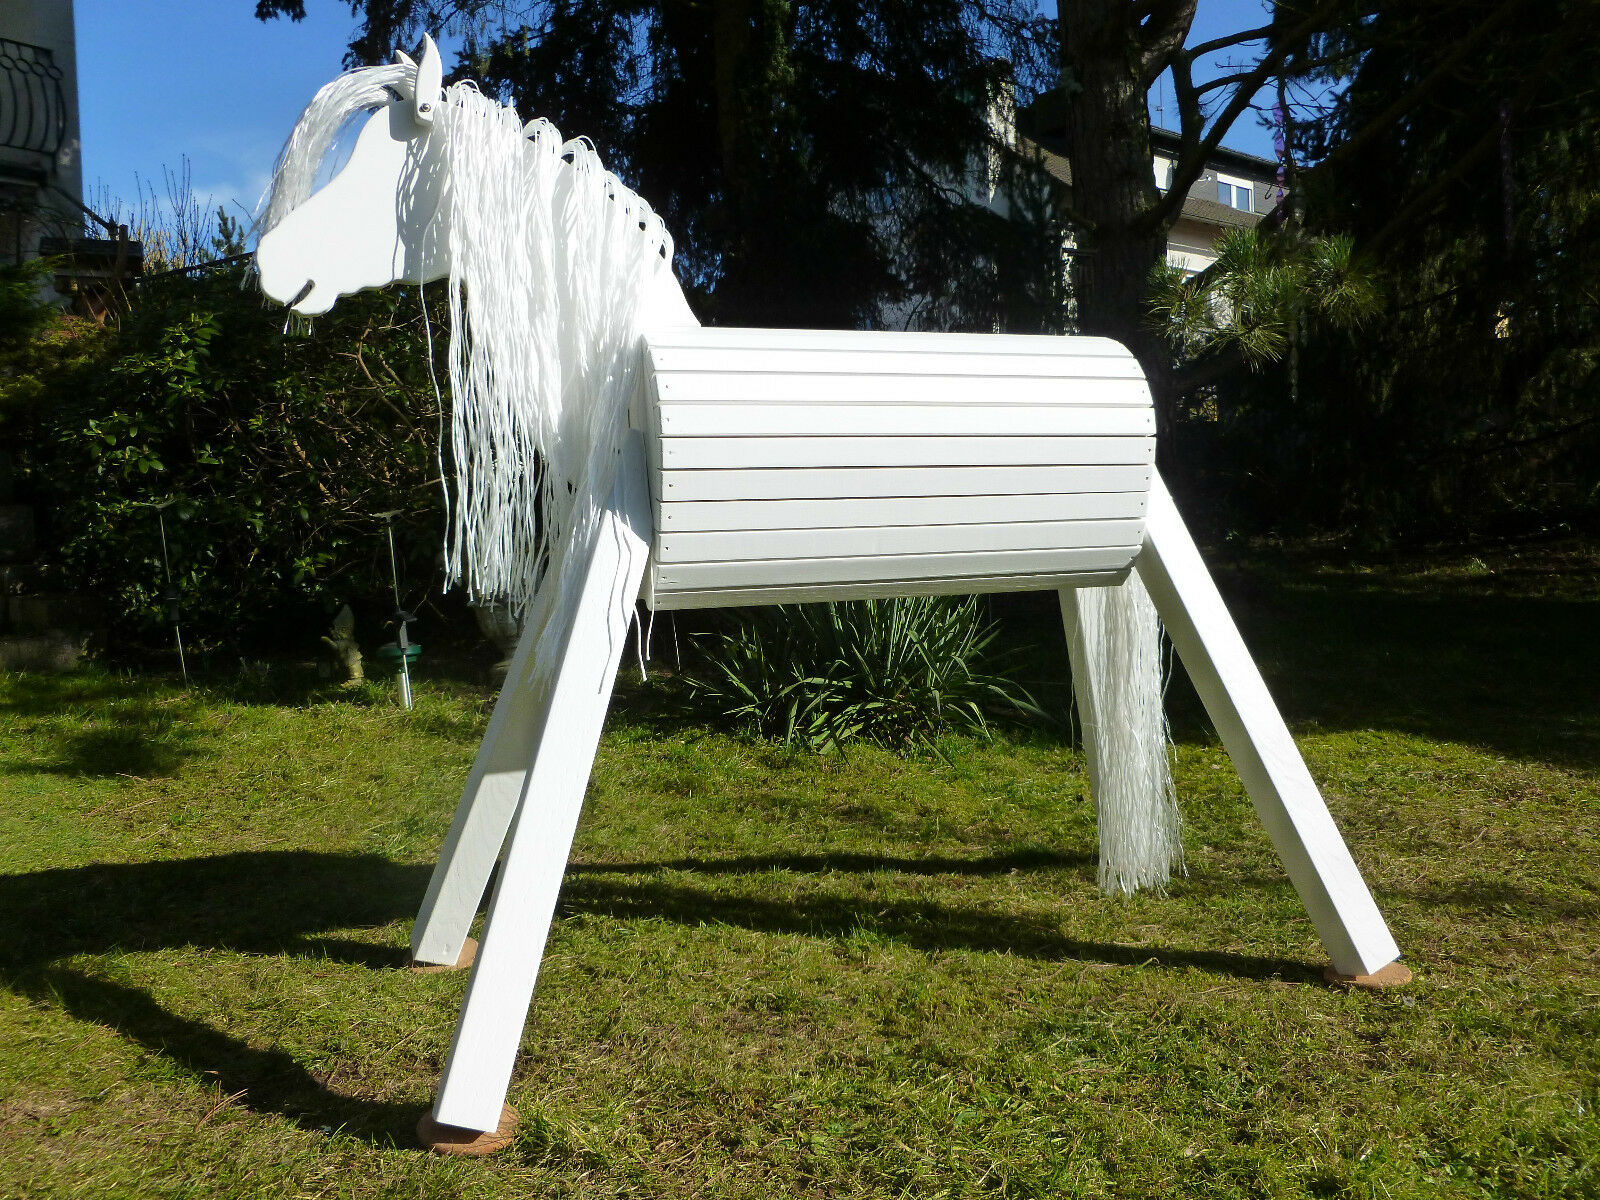 110 cm Holzpferd Pony Holzpony Voltigierpferd Spielpferd Pferd Pony Holzpferd Lippizzaner NEU 1b89a1